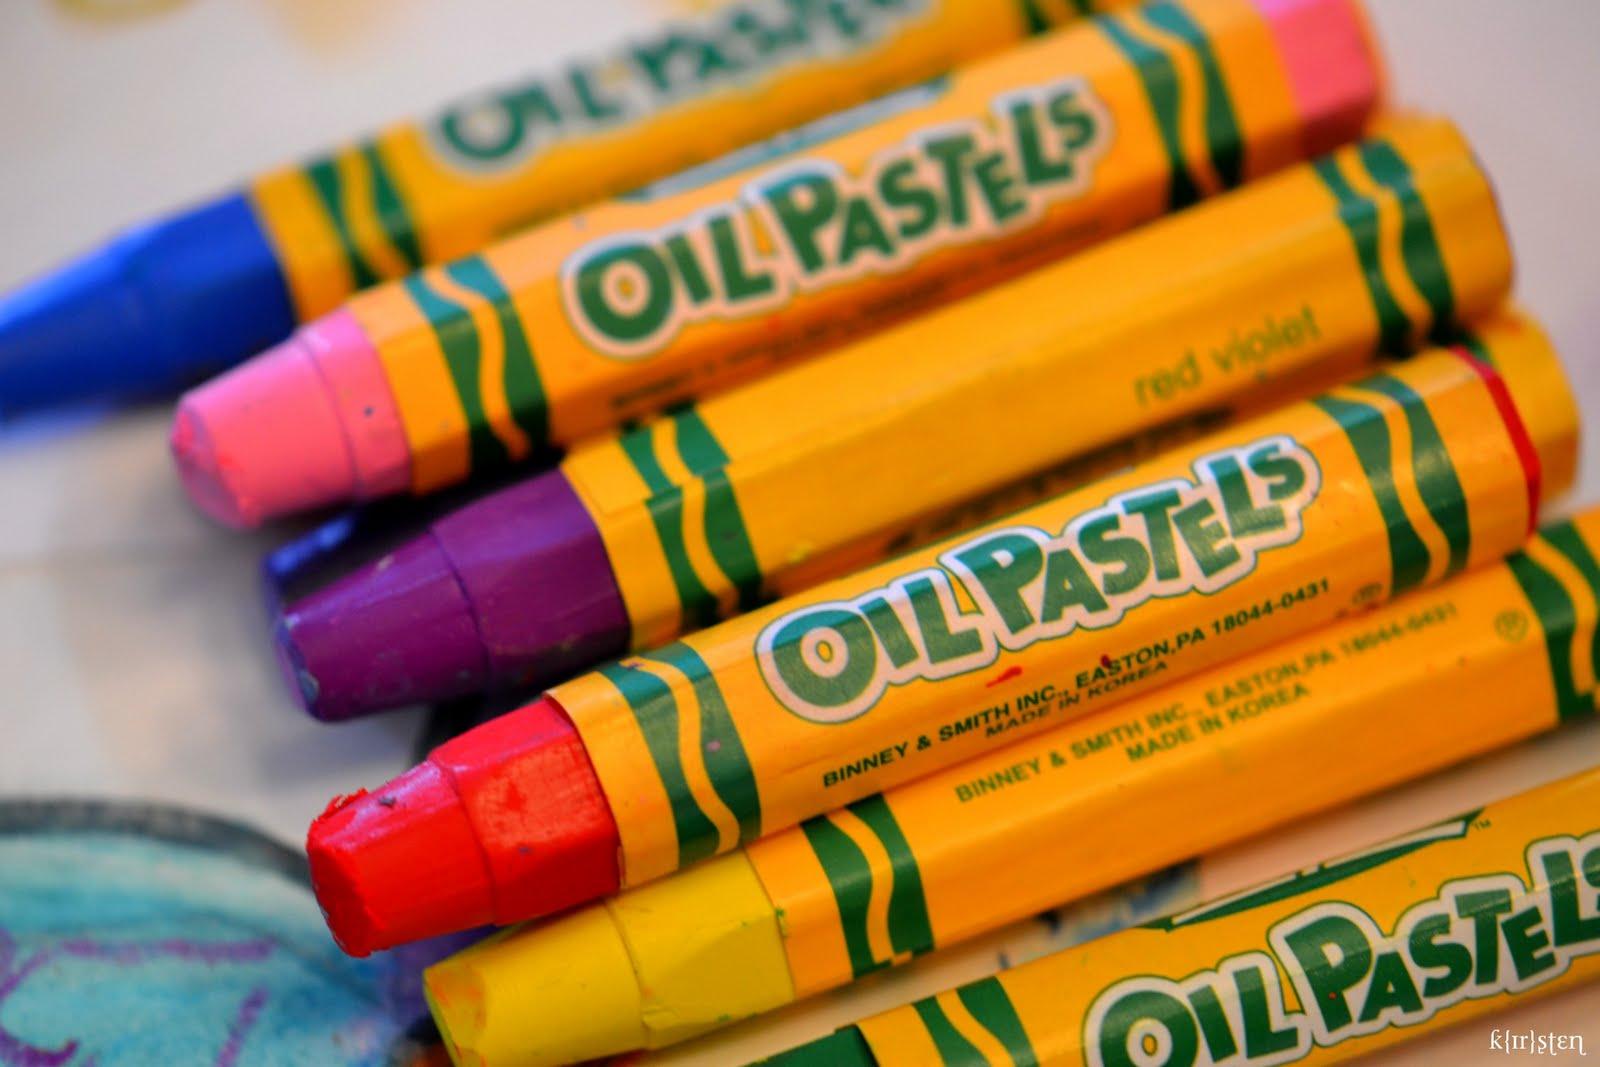 Oil pastel clipart jpg library Oil pastel clipart - ClipartFest jpg library